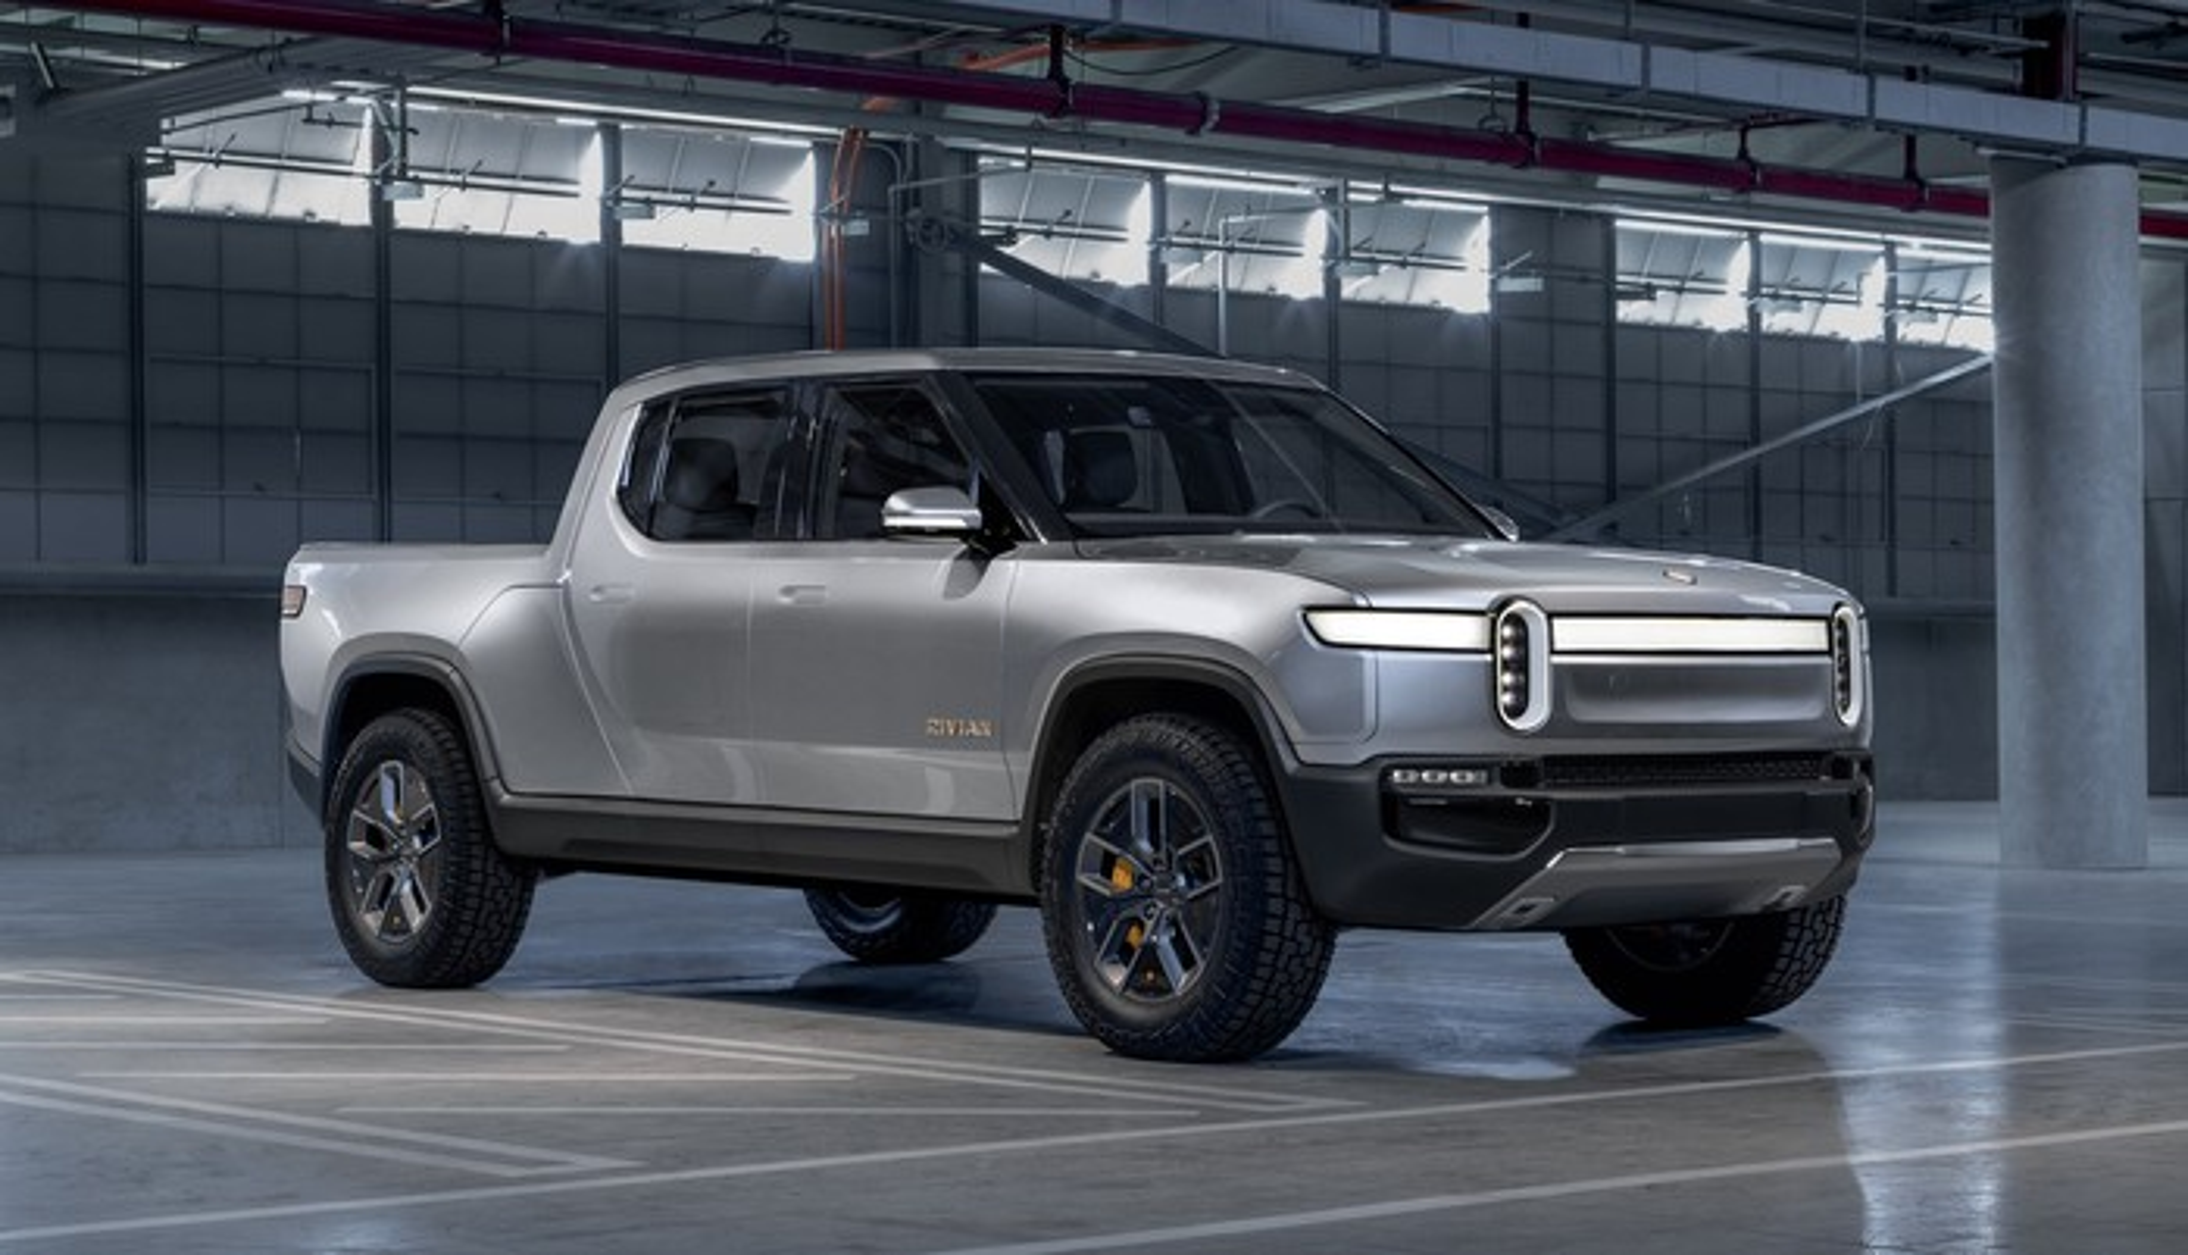 A Rivian R1T, a sleek, futuristic-looking full-size electric pickup truck